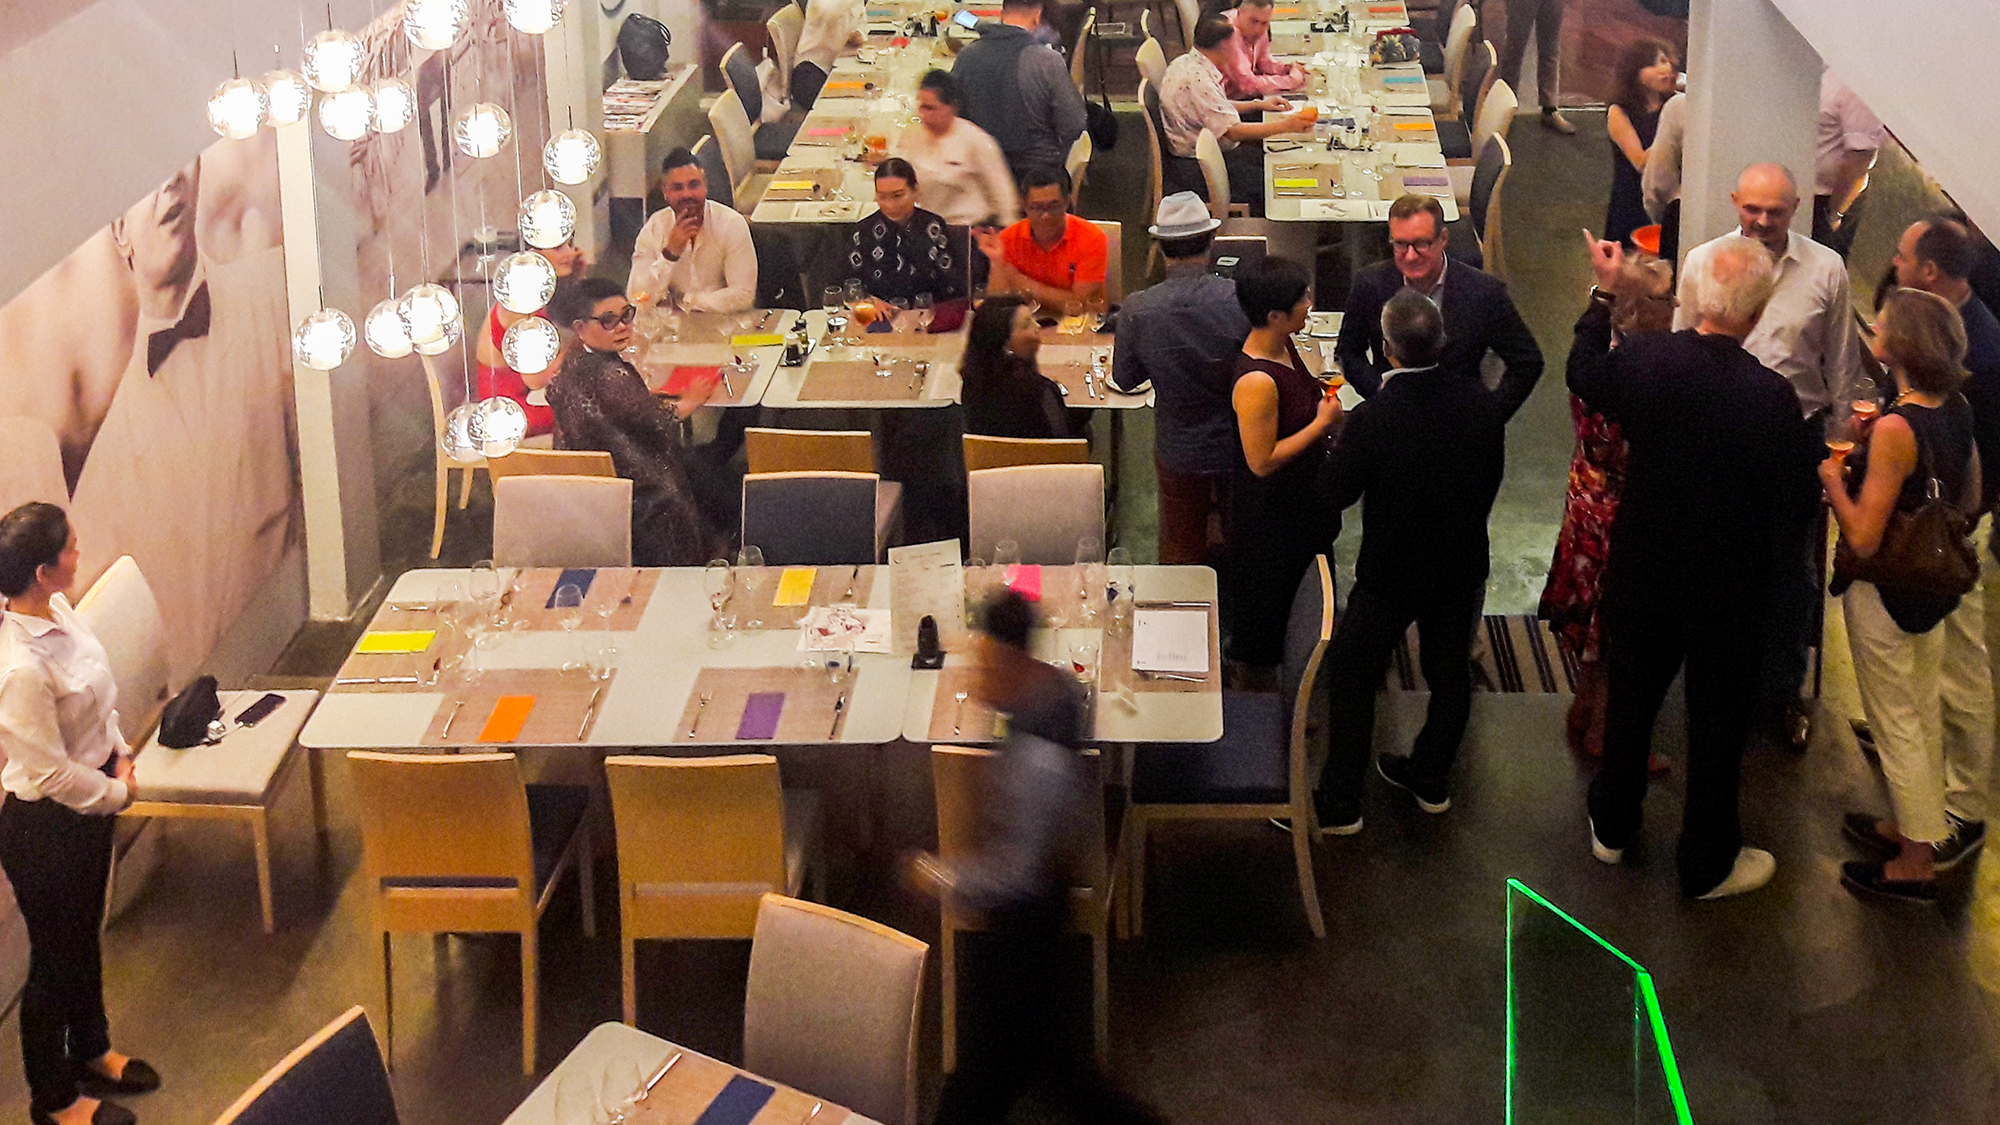 Calderazzo on 31 สุขุมวิท ร้านอาหารอิตาเลี่ยน  Calderazzo on 31 อาหารอิตาเลี่ยนแท้ๆ จัดแพริ่งไวน์ และ Grand Opening 20180510 192928